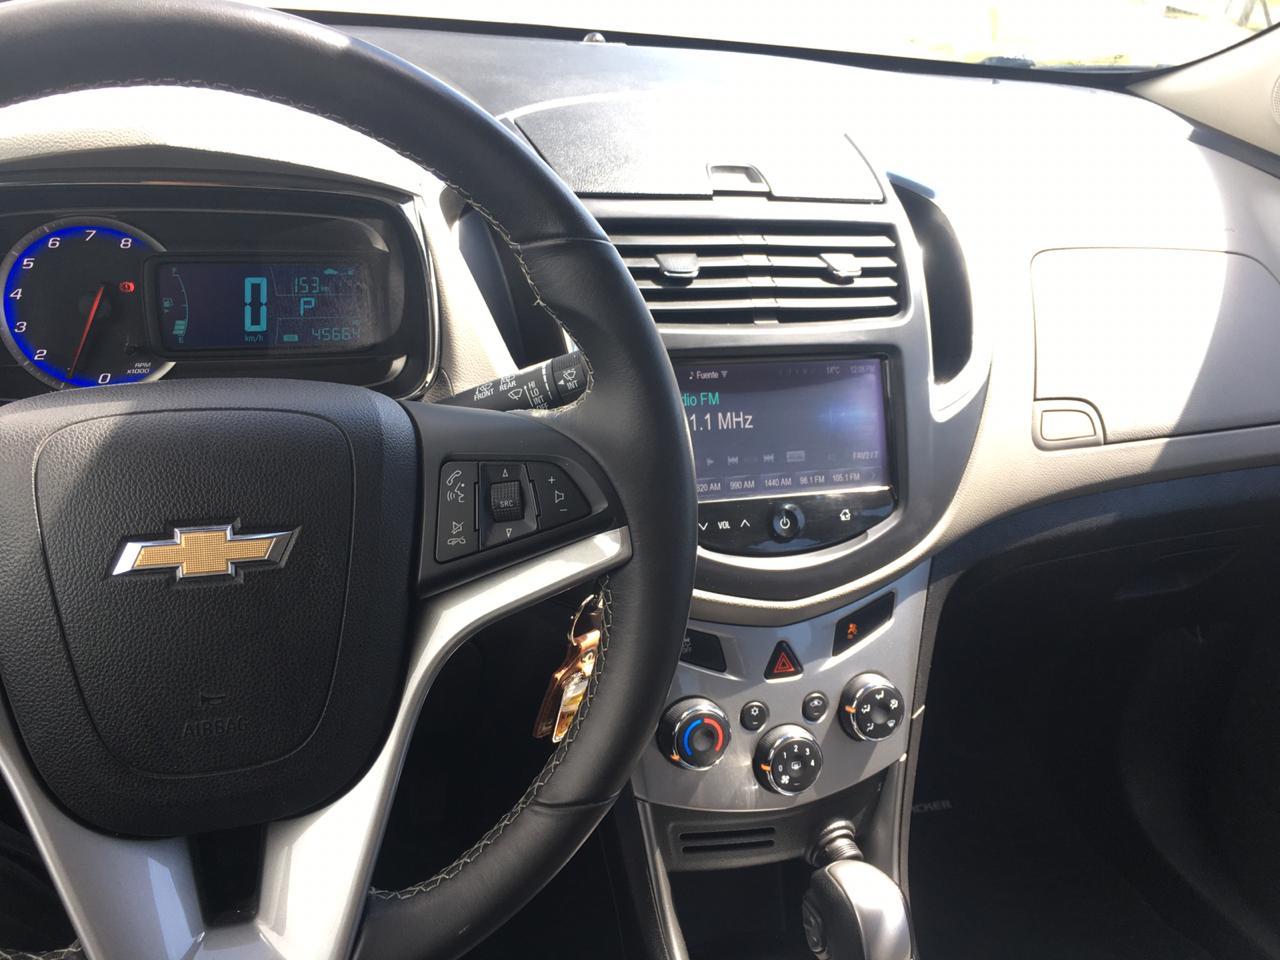 2016 Chevrolet TRACKER LTZ+ AT AWD LTZ 1.8N